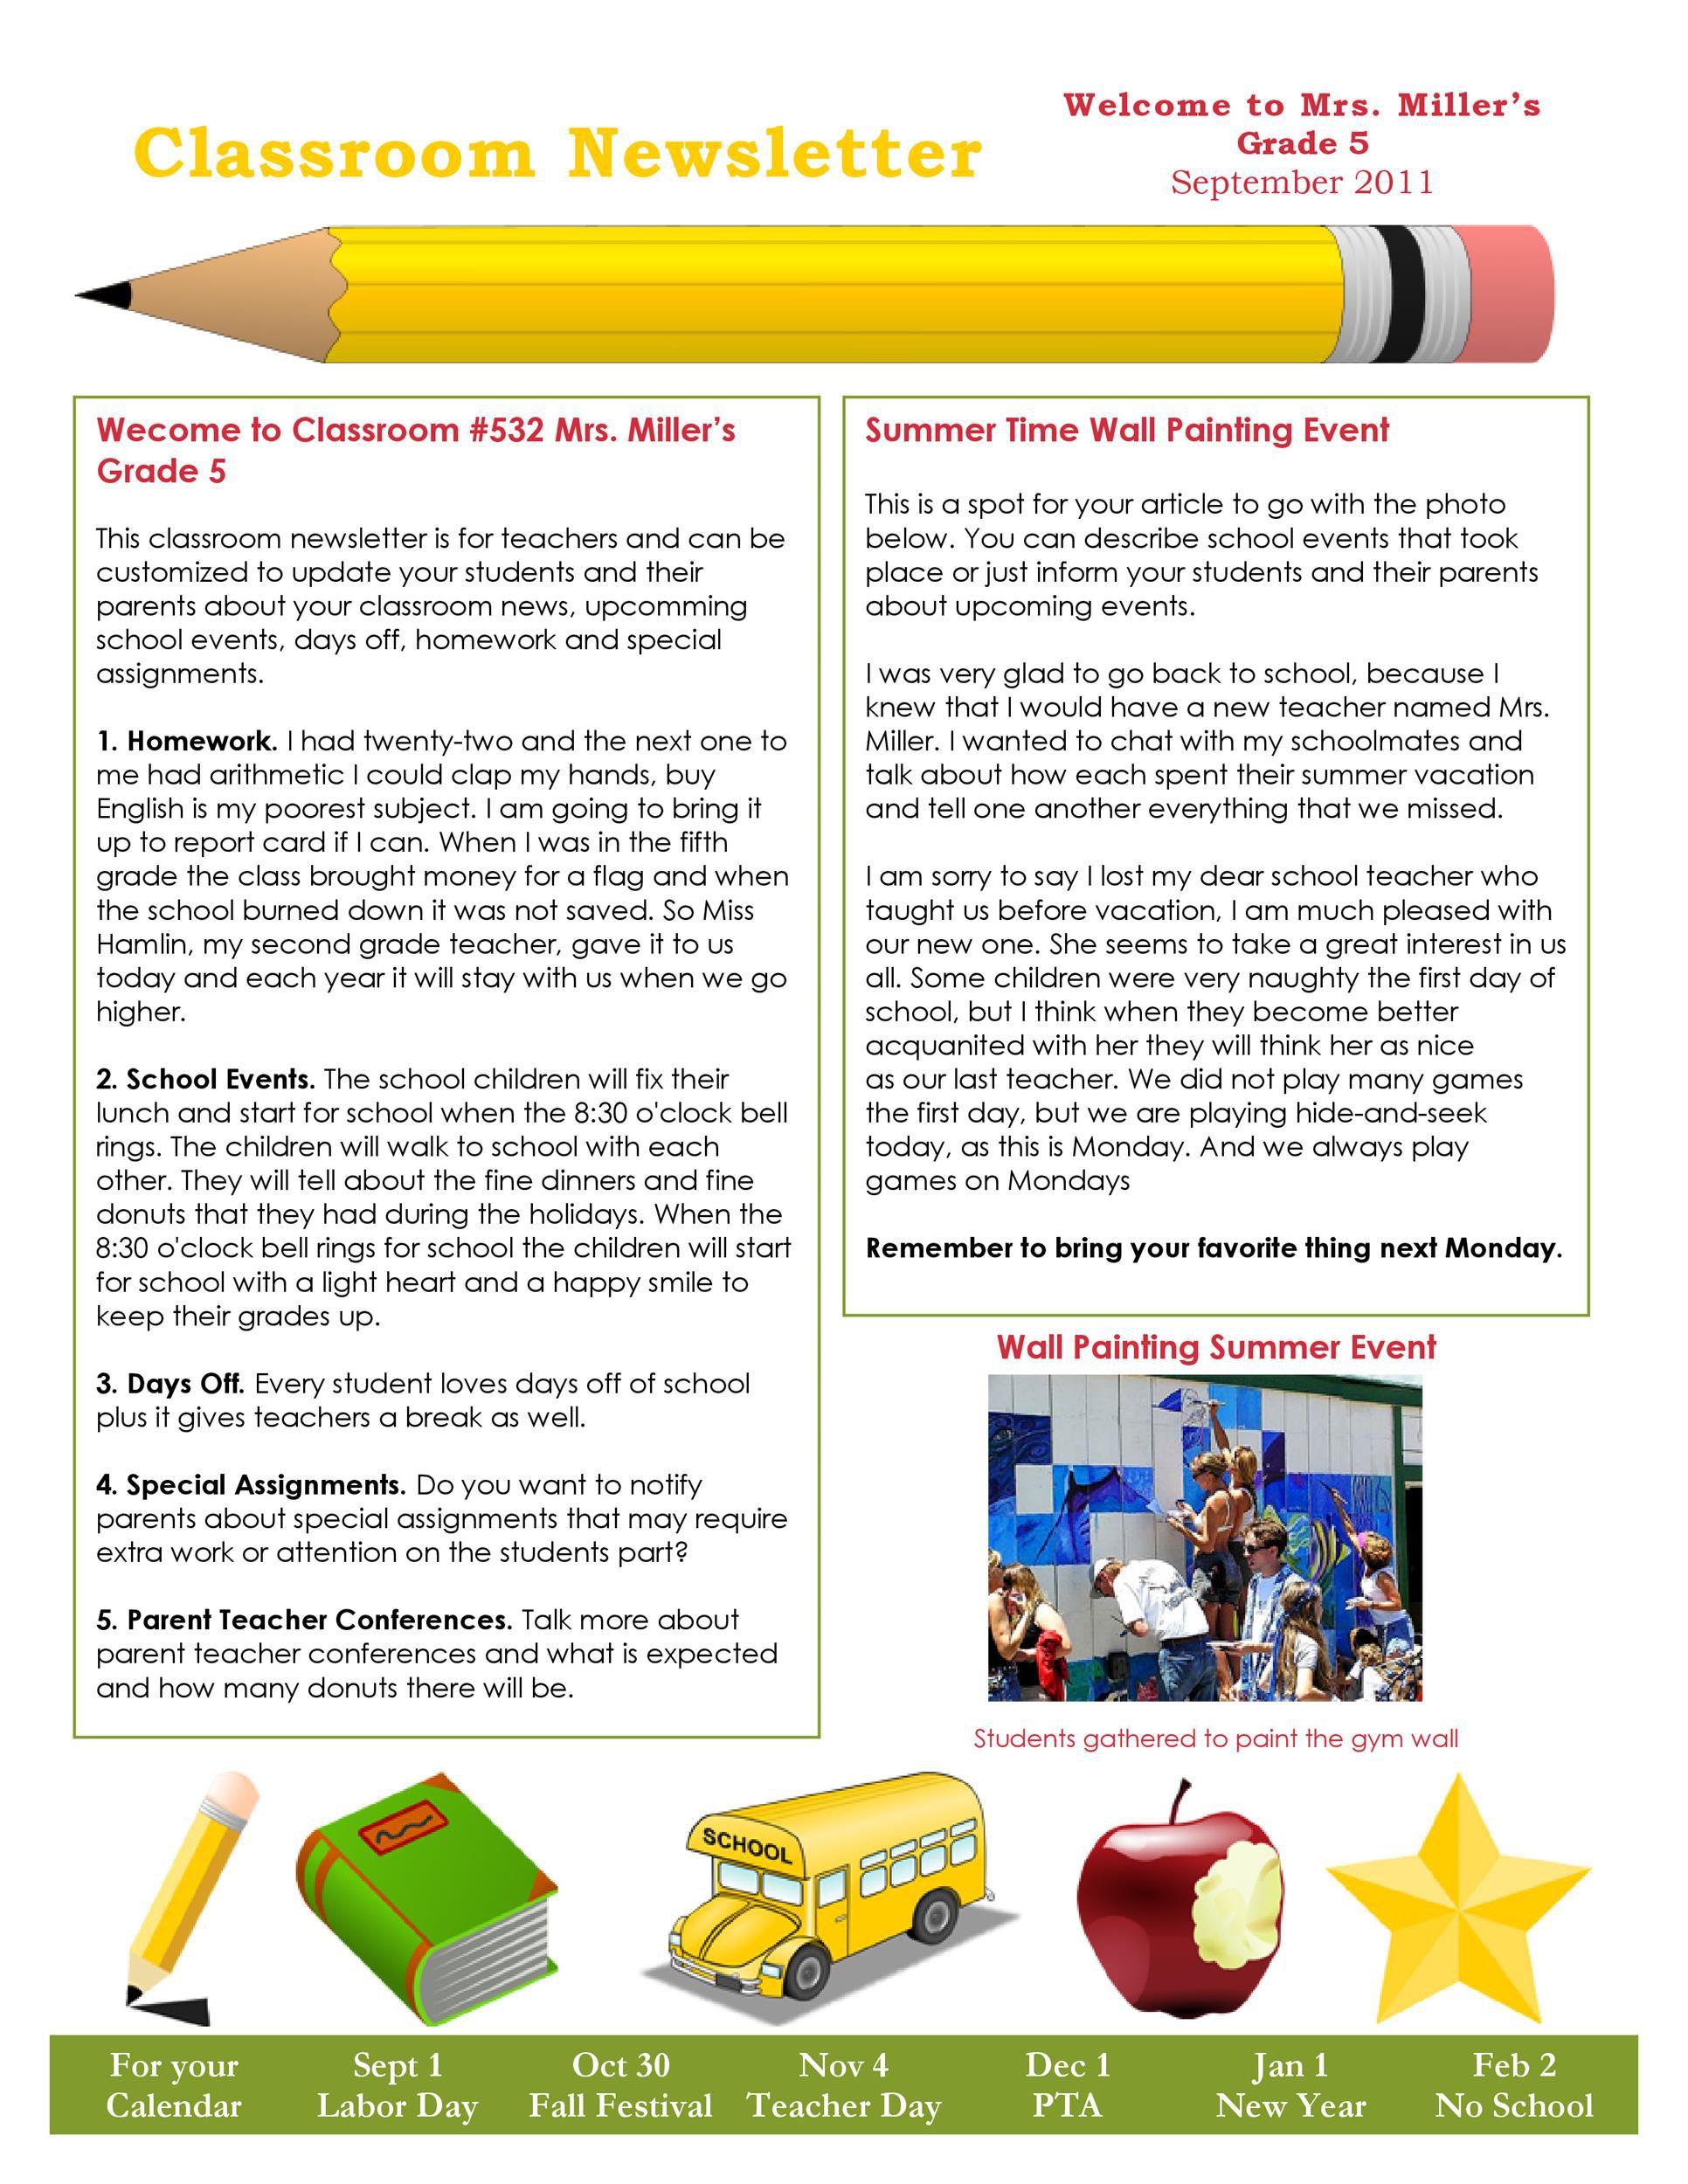 008 Top Elementary School Newsletter Template Concept  Clas Teacher Free CounselorFull